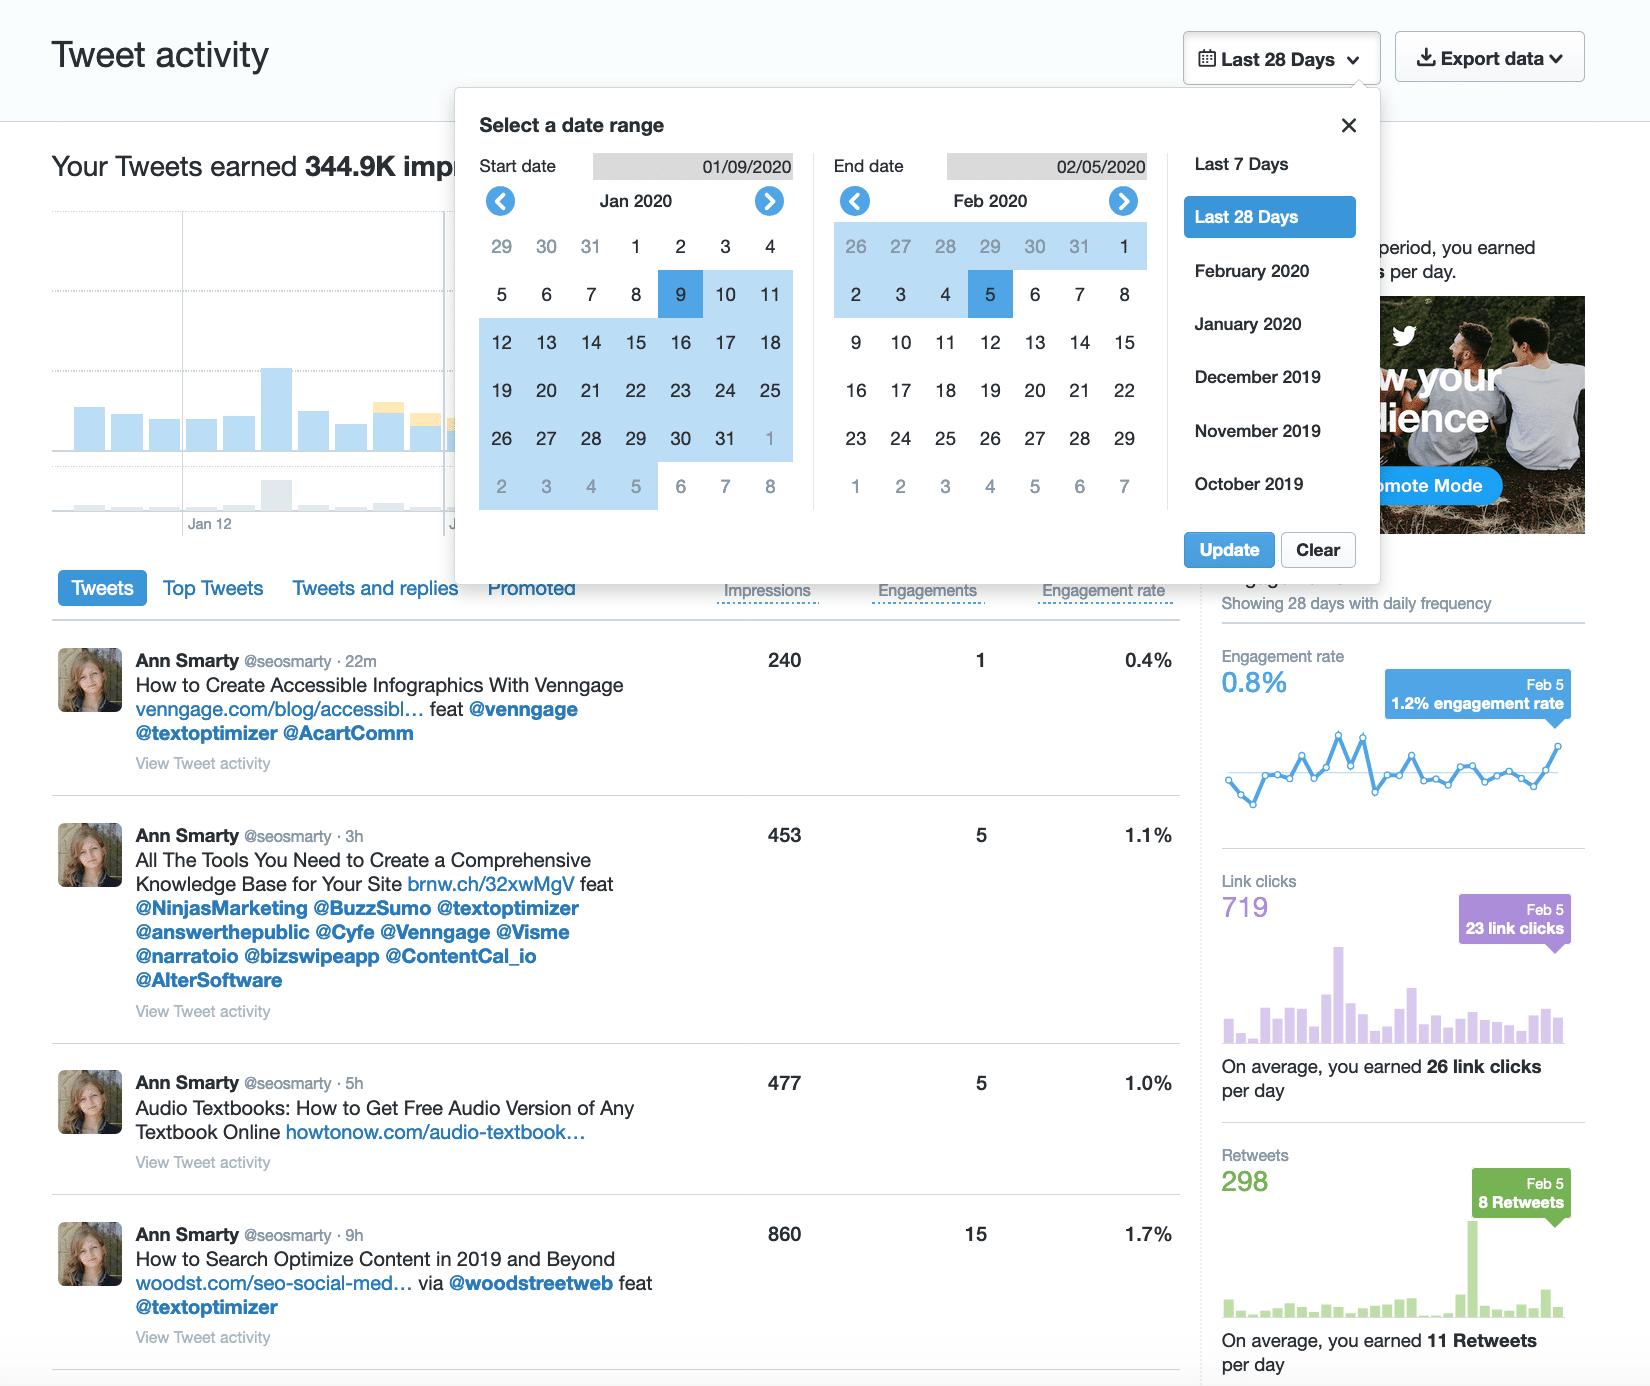 tweet activity according to twitter analytics